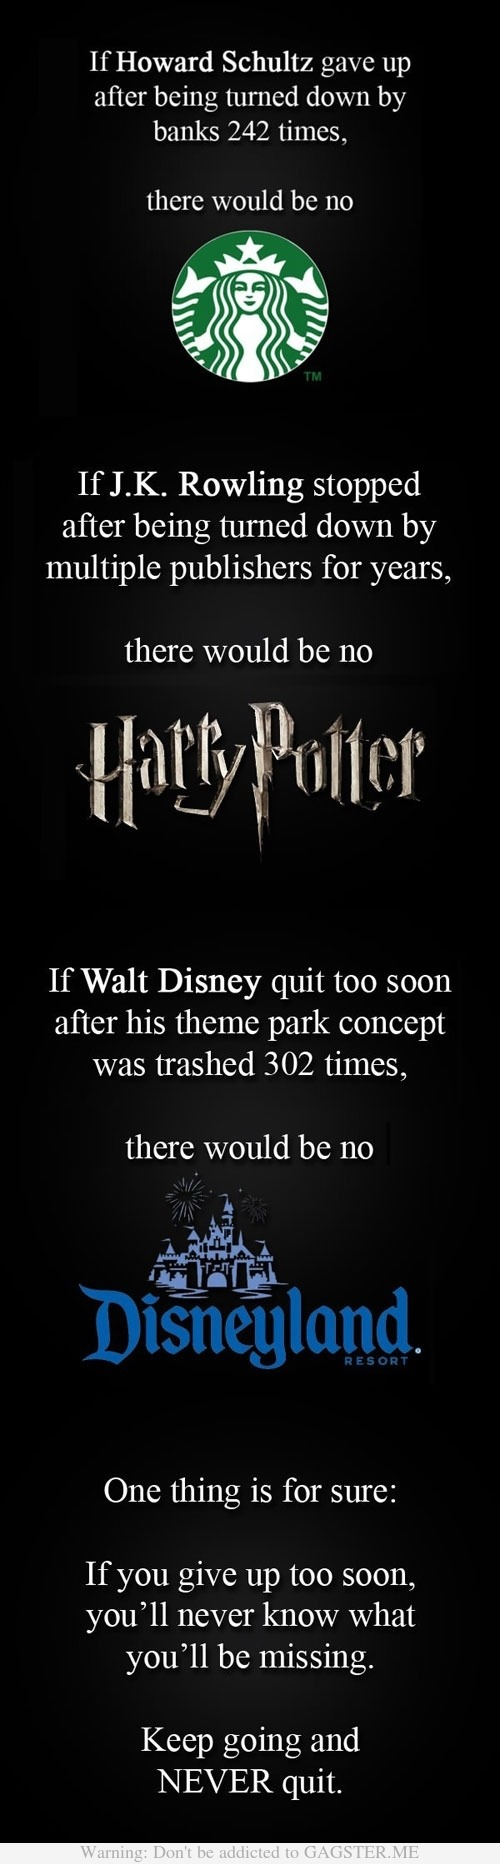 never quit…